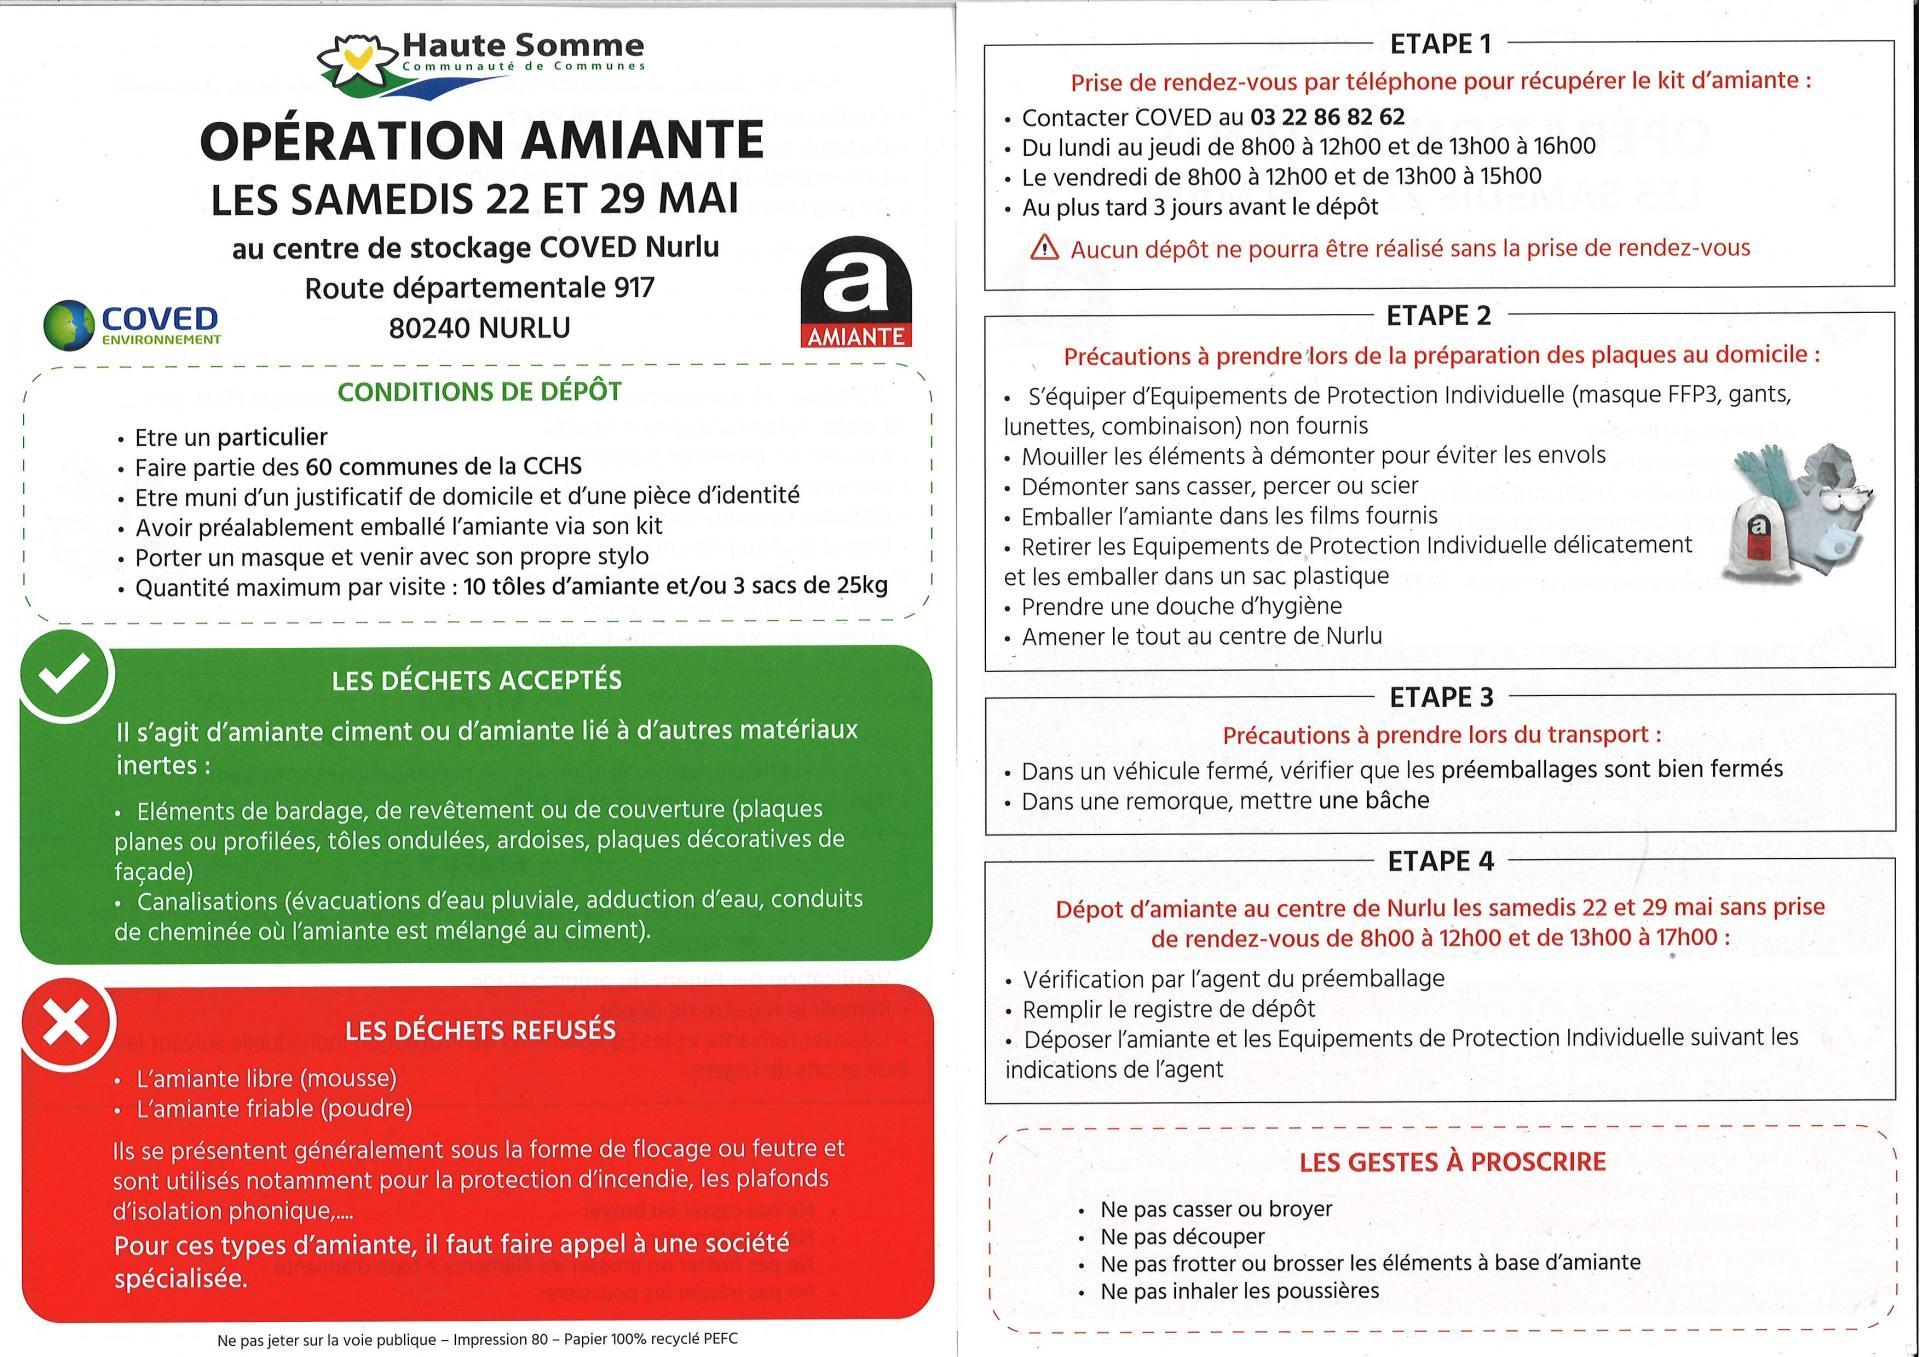 Opération AMIANTE samedi 22 mai et samedi 29 mai 2021